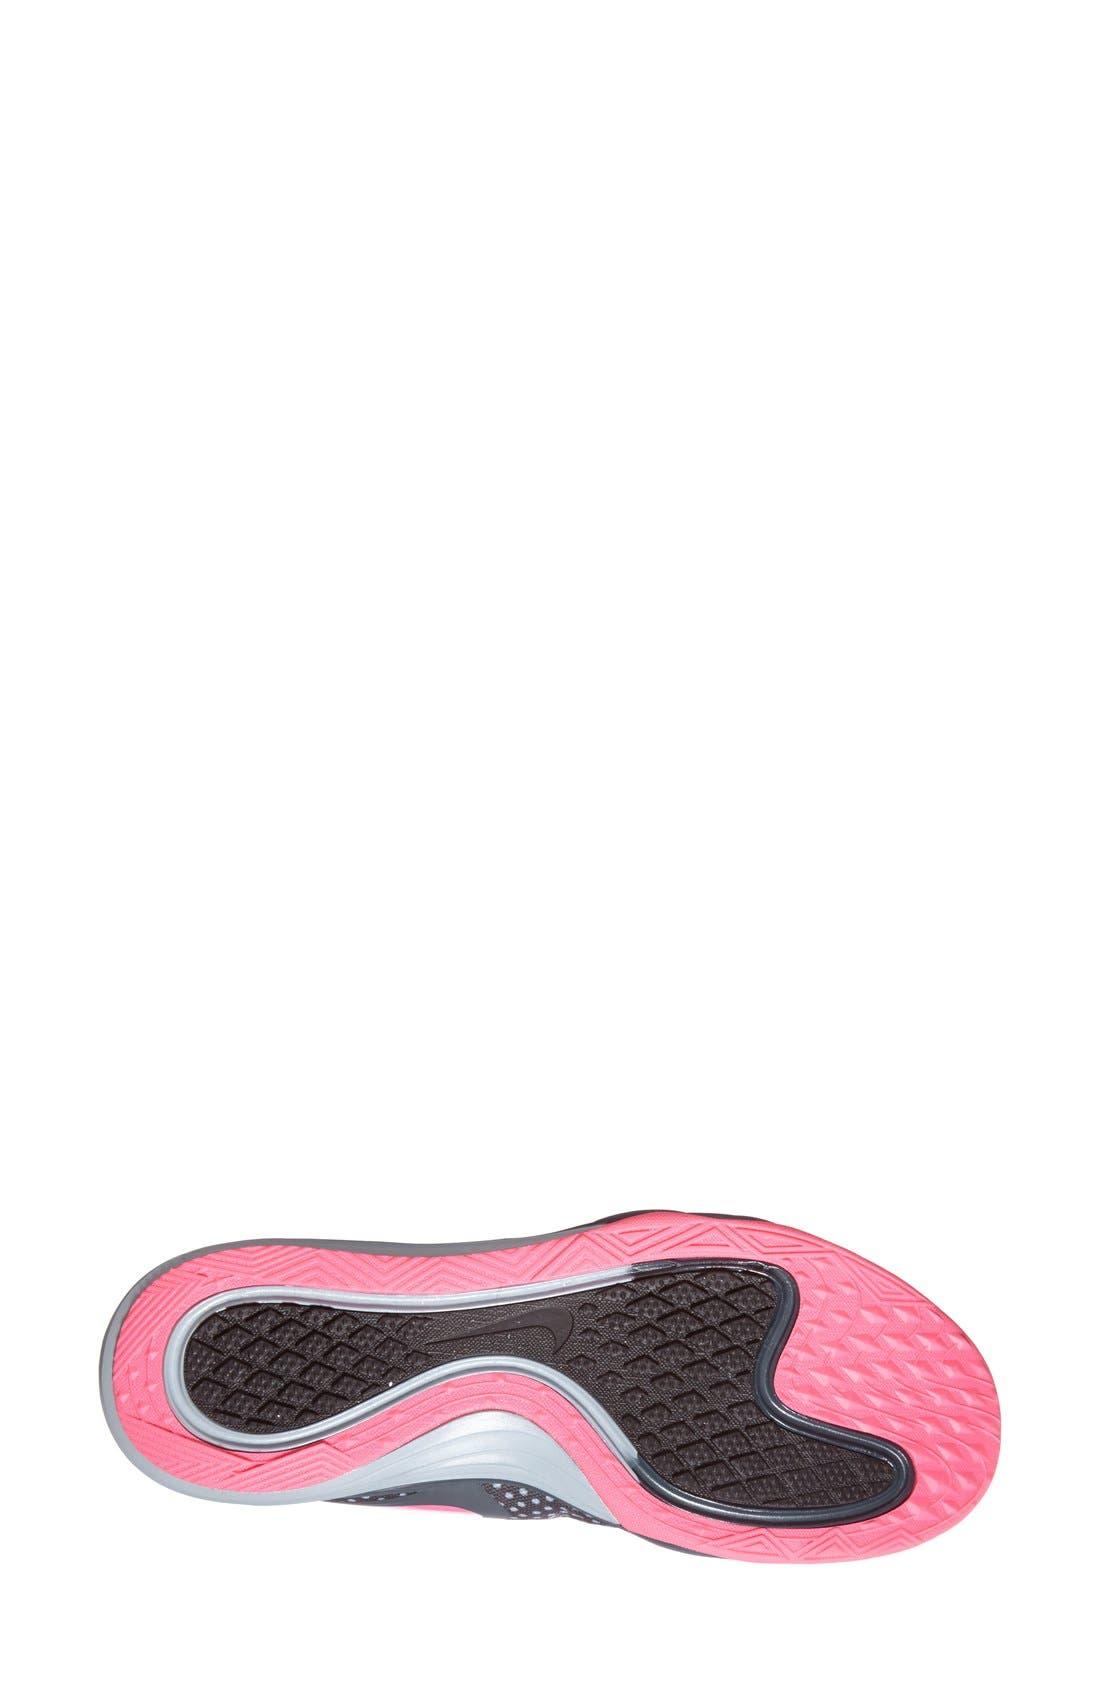 Alternate Image 4  - Nike 'Dual Fusion 3' Training Shoe (Women)